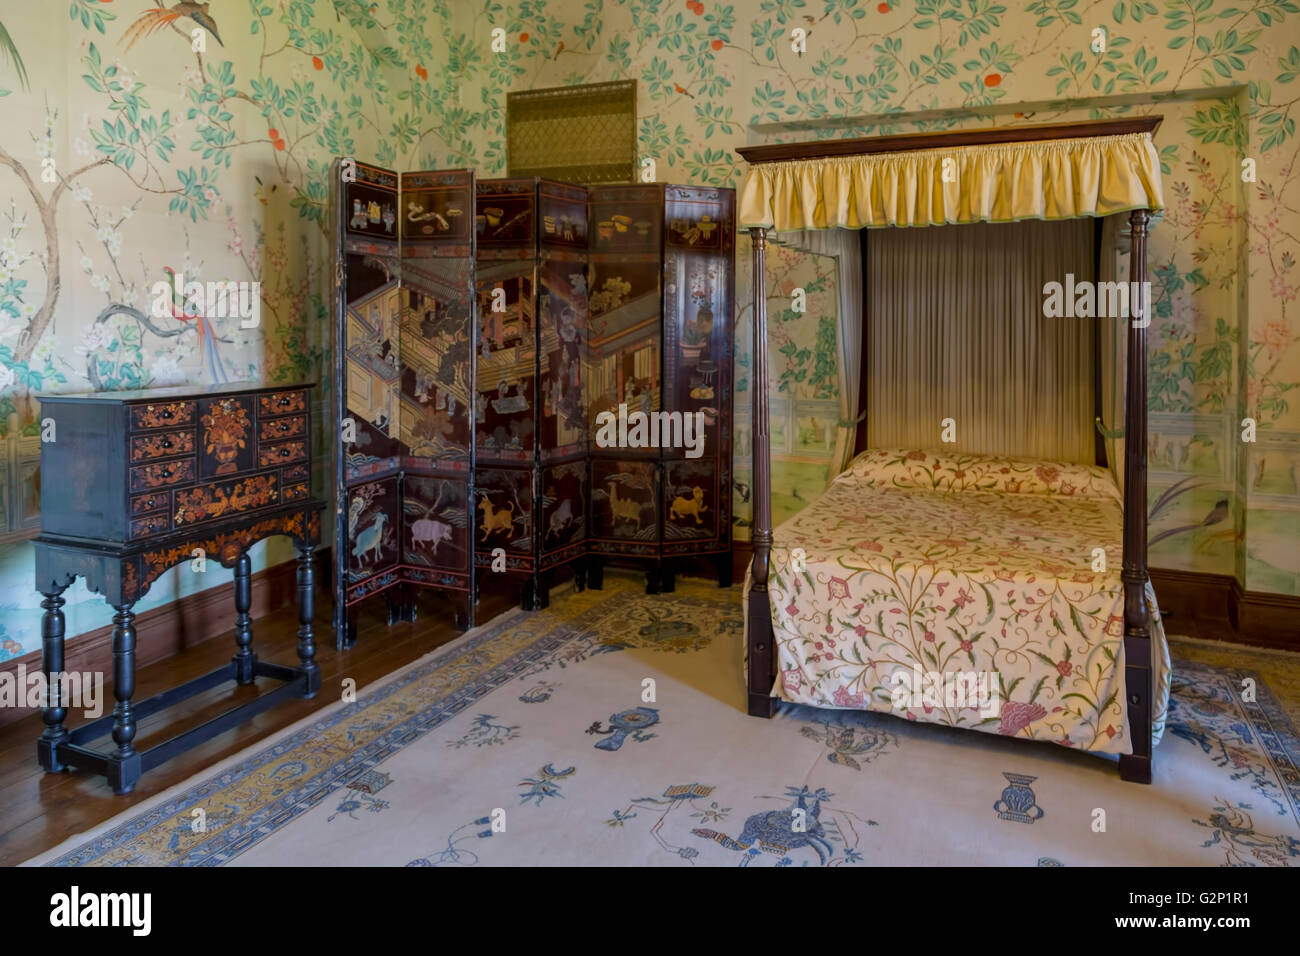 Chinese Wallpaper Stockfotos & Chinese Wallpaper Bilder - Alamy